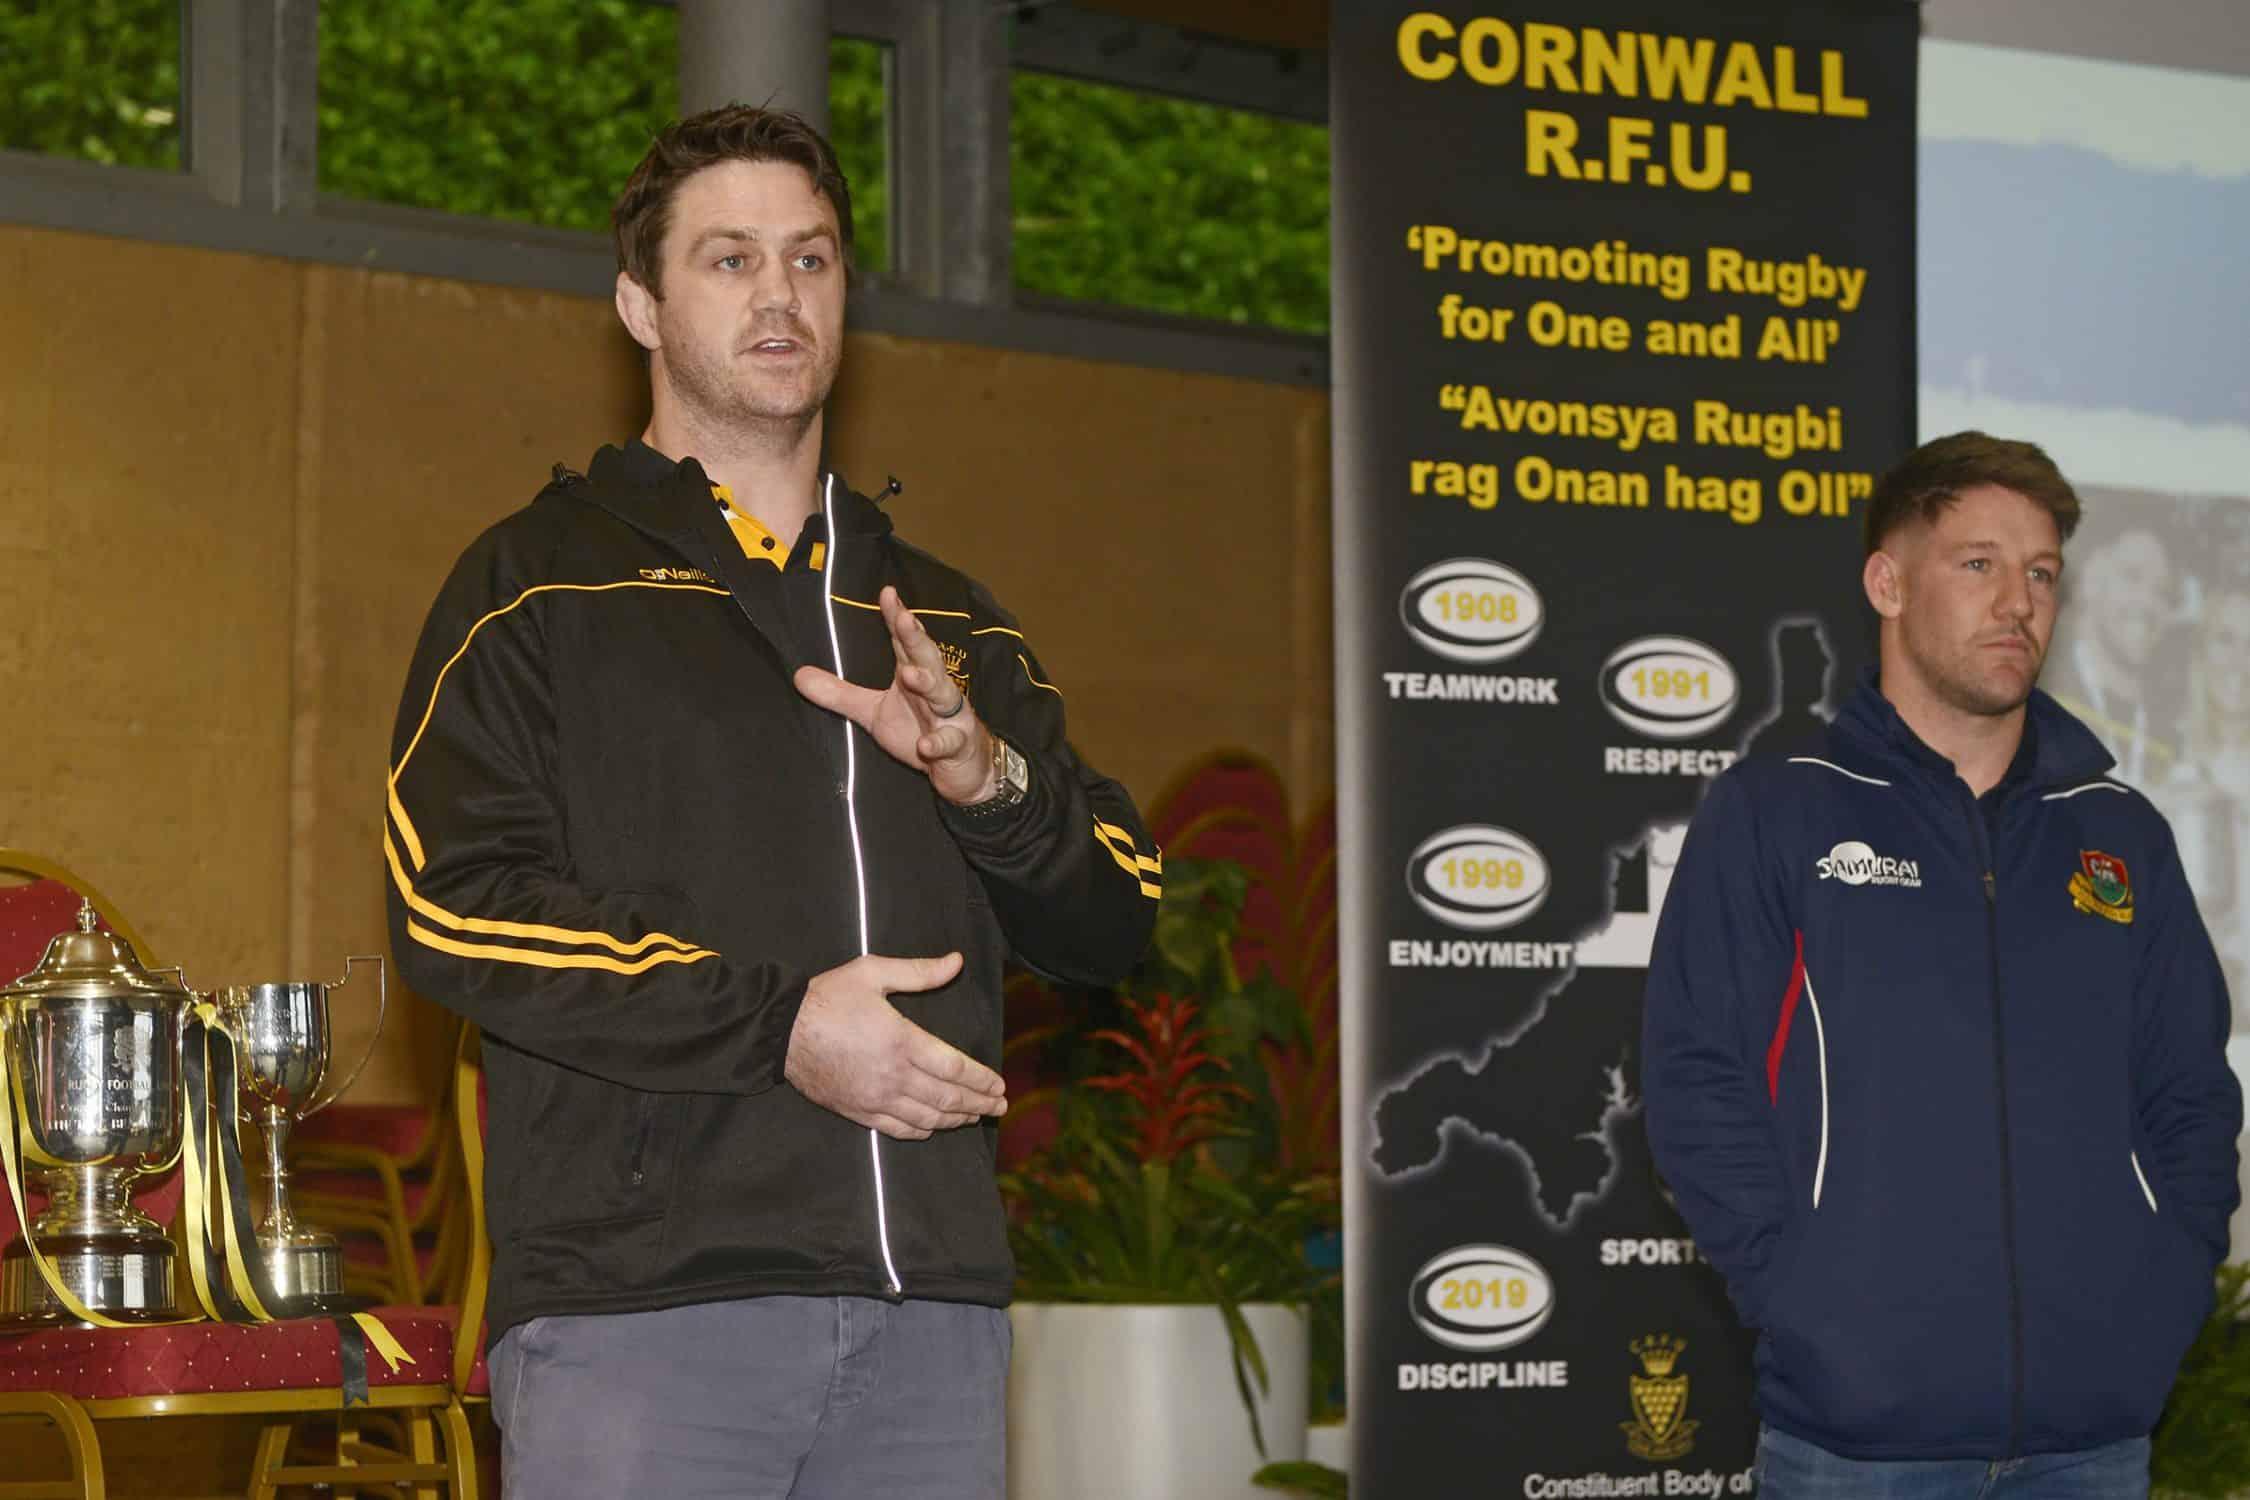 Cornwall Team Building, St Austell UK – 09 February 2020